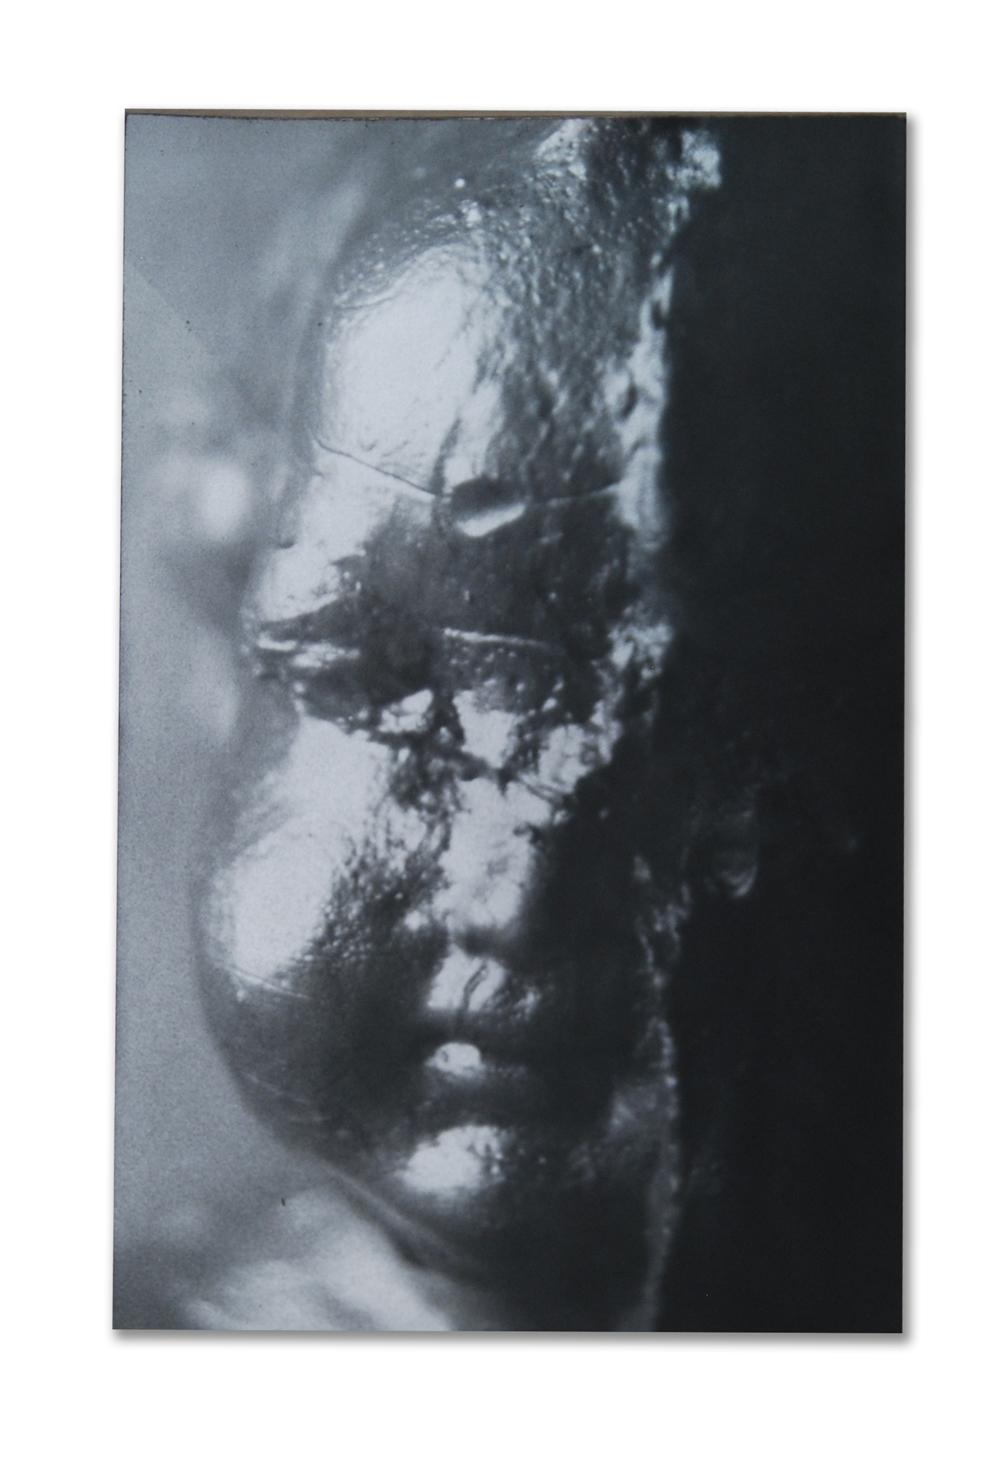 Metallic Cupid (Darkroom print on metallic paper, mounted on cardstock)